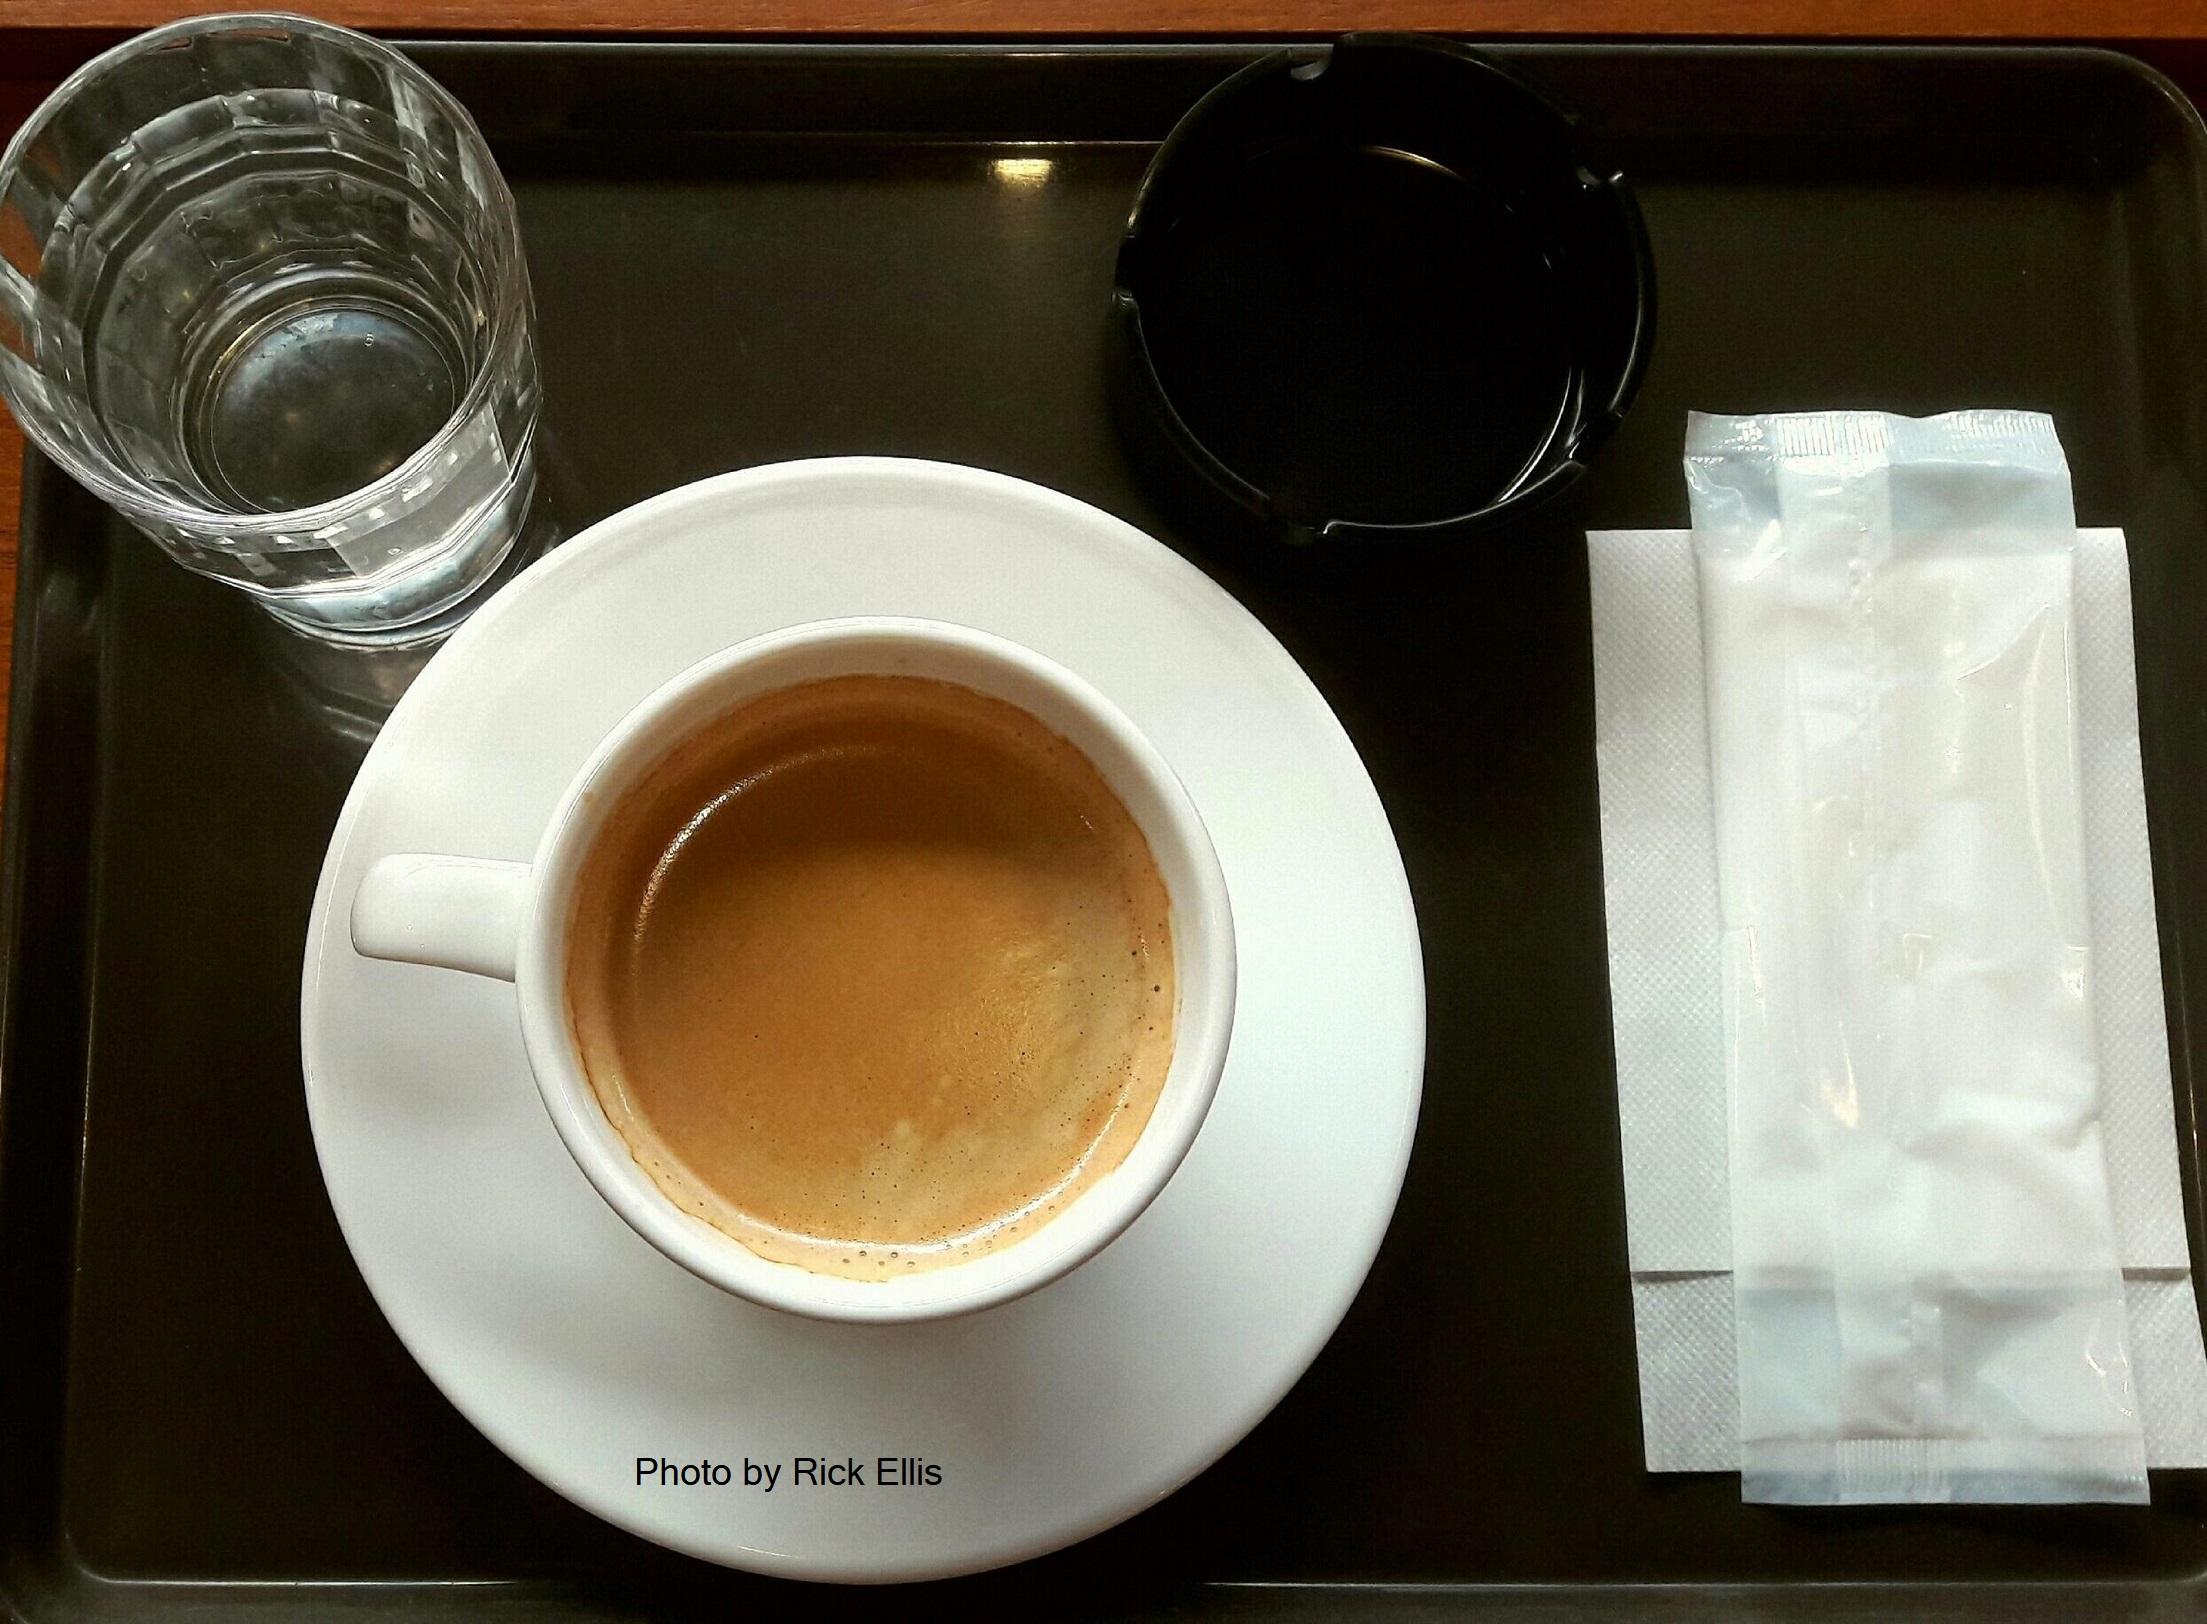 A cup of coffee served at Saint Marc Café in Nagasaki, Japan. Photo: Rick Ellis